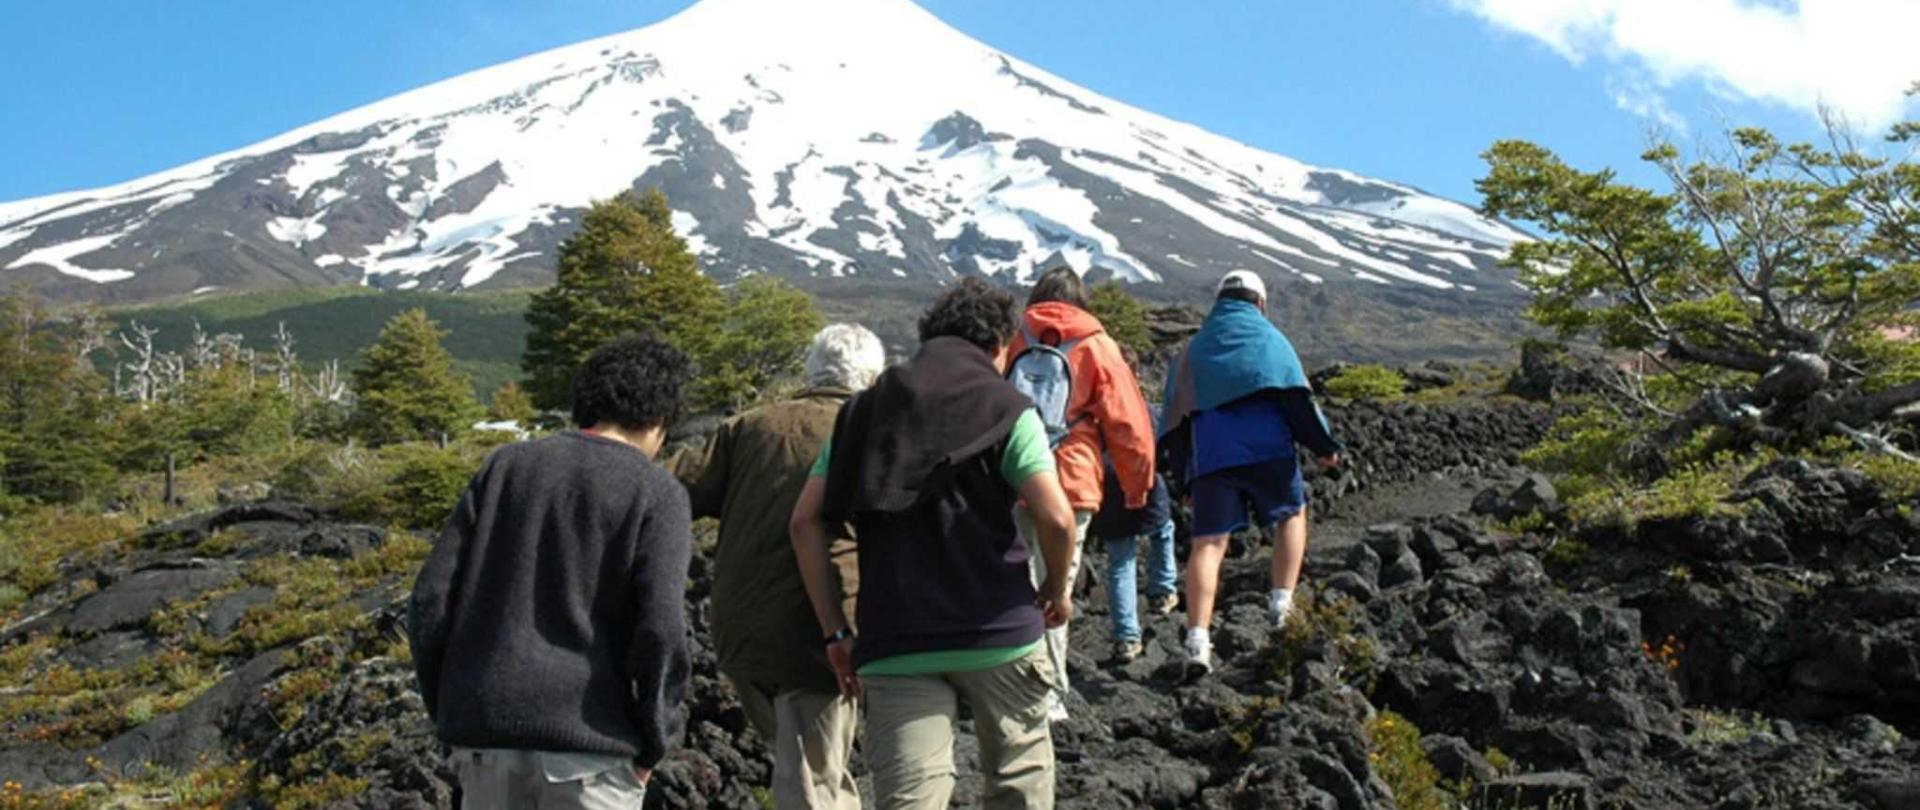 cuevas-volcanicas-villarrica-1-1.jpg